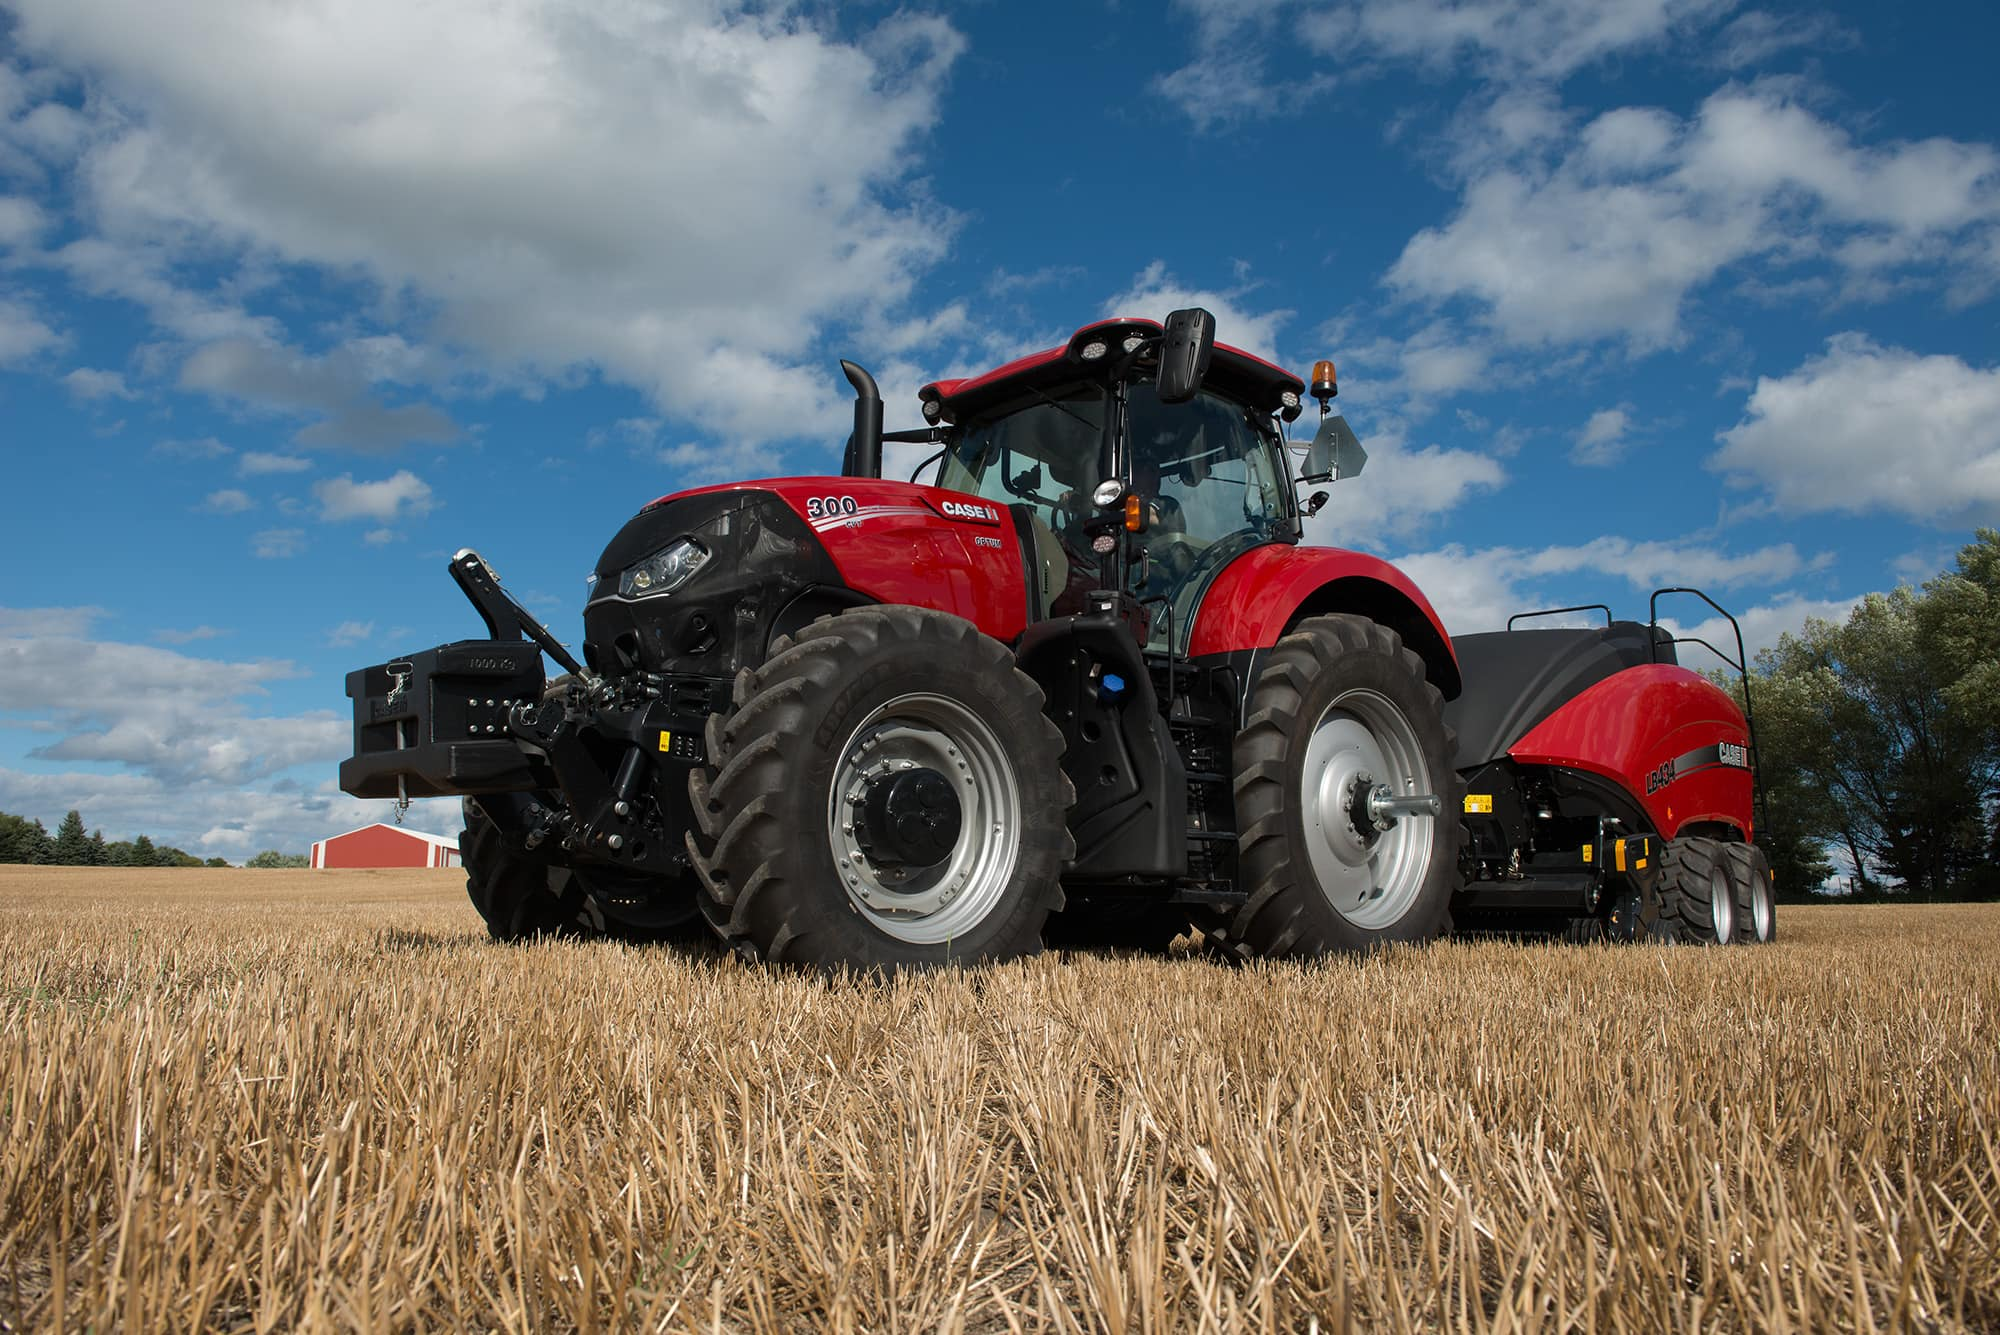 Optum Series Row Crop Hay Forage Tractors Case Ih Car Brakes Diagram Displaying 15 Images For Toolbar